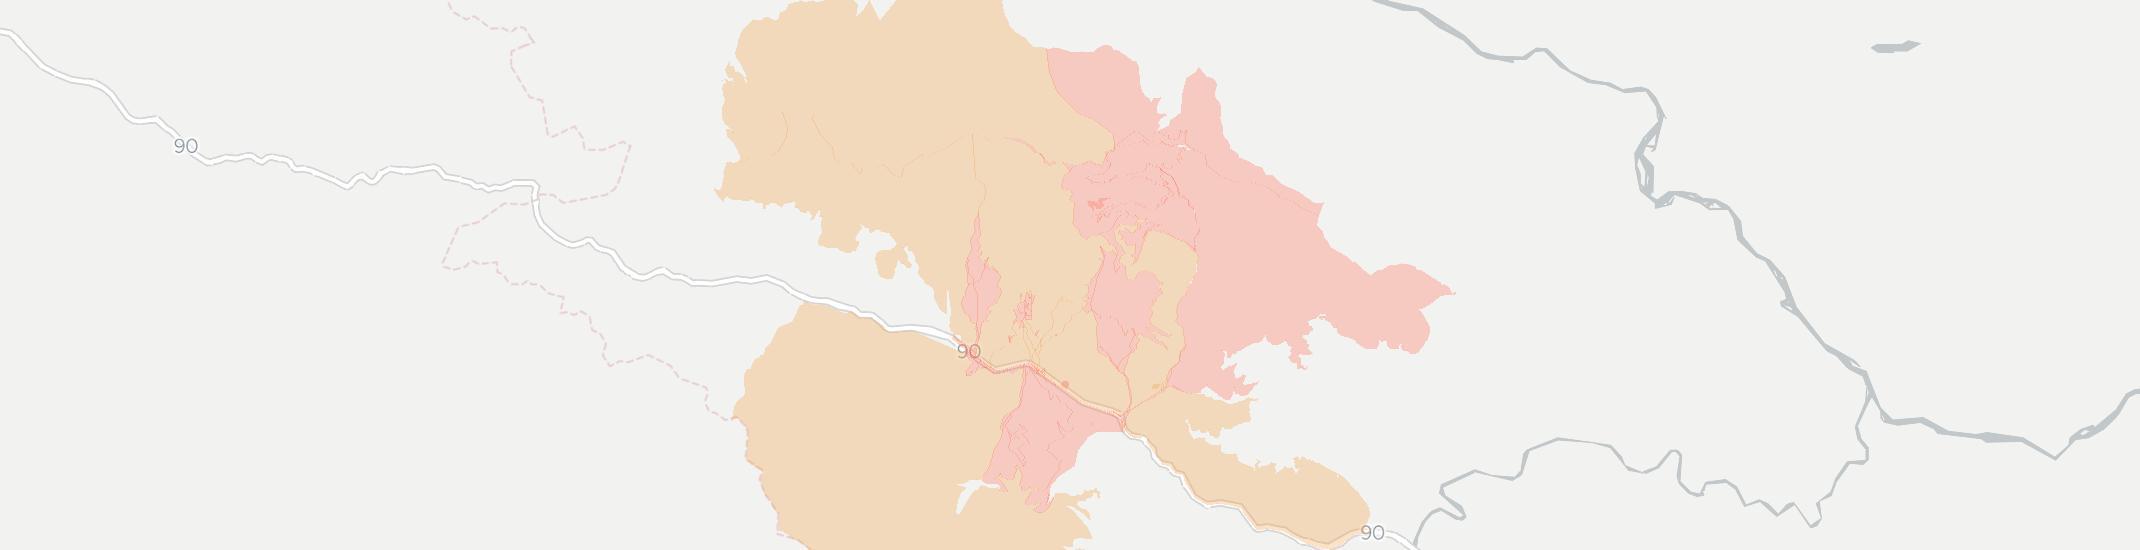 De Borgia Internet Competition Map. Click for interactive map.